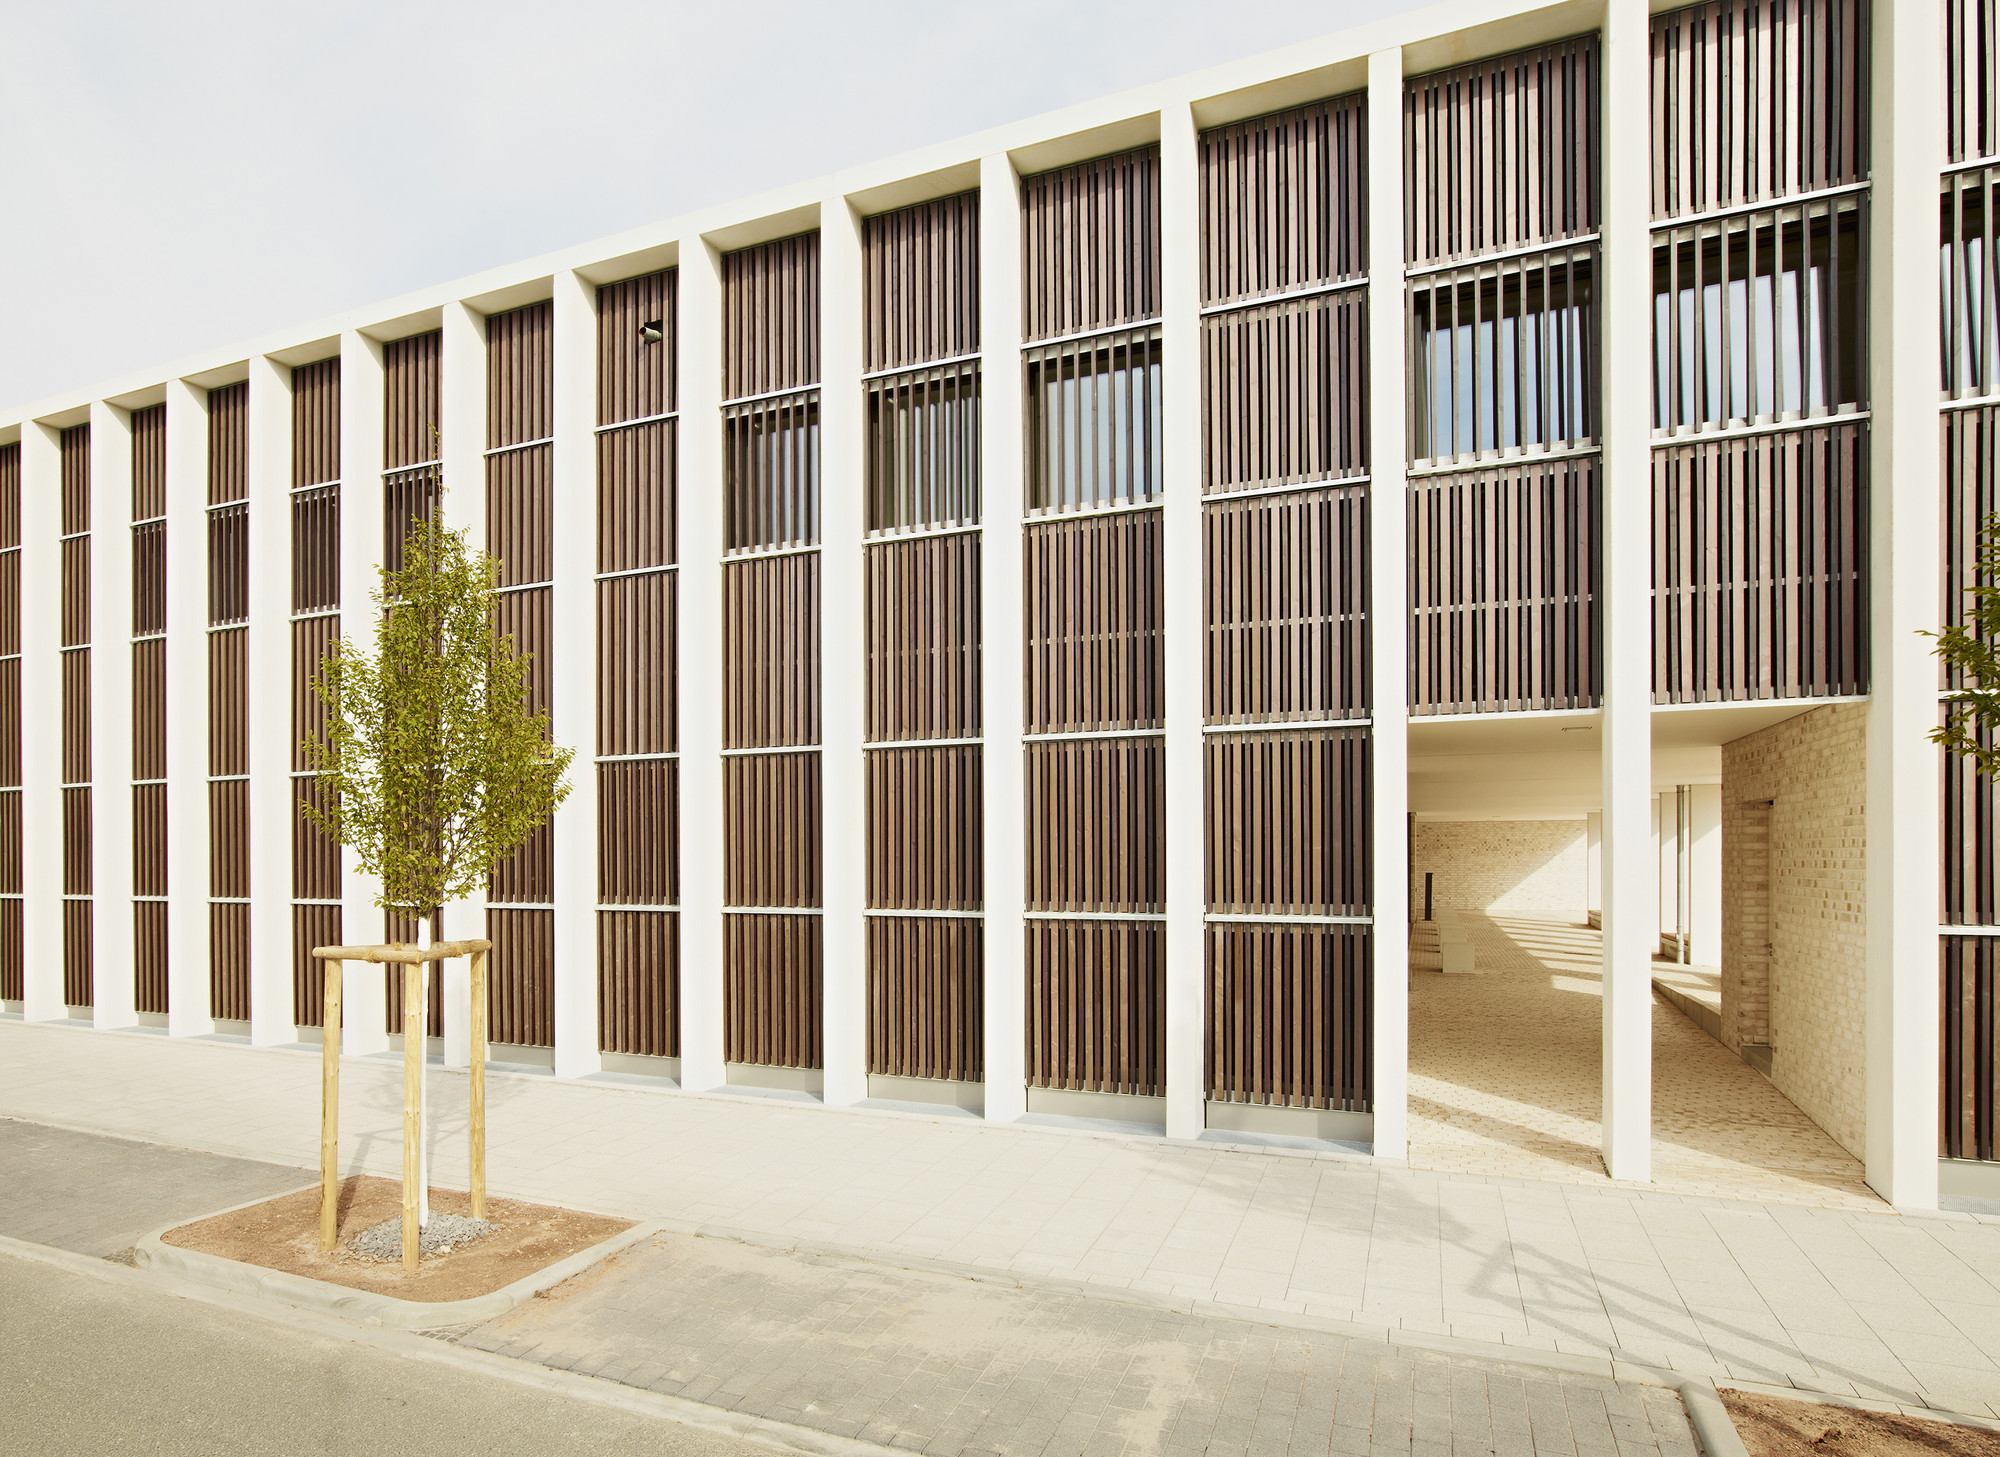 Grammar School Frankfurt-Riedberg  / Ackermann+Raff, © Thomas Herrmann